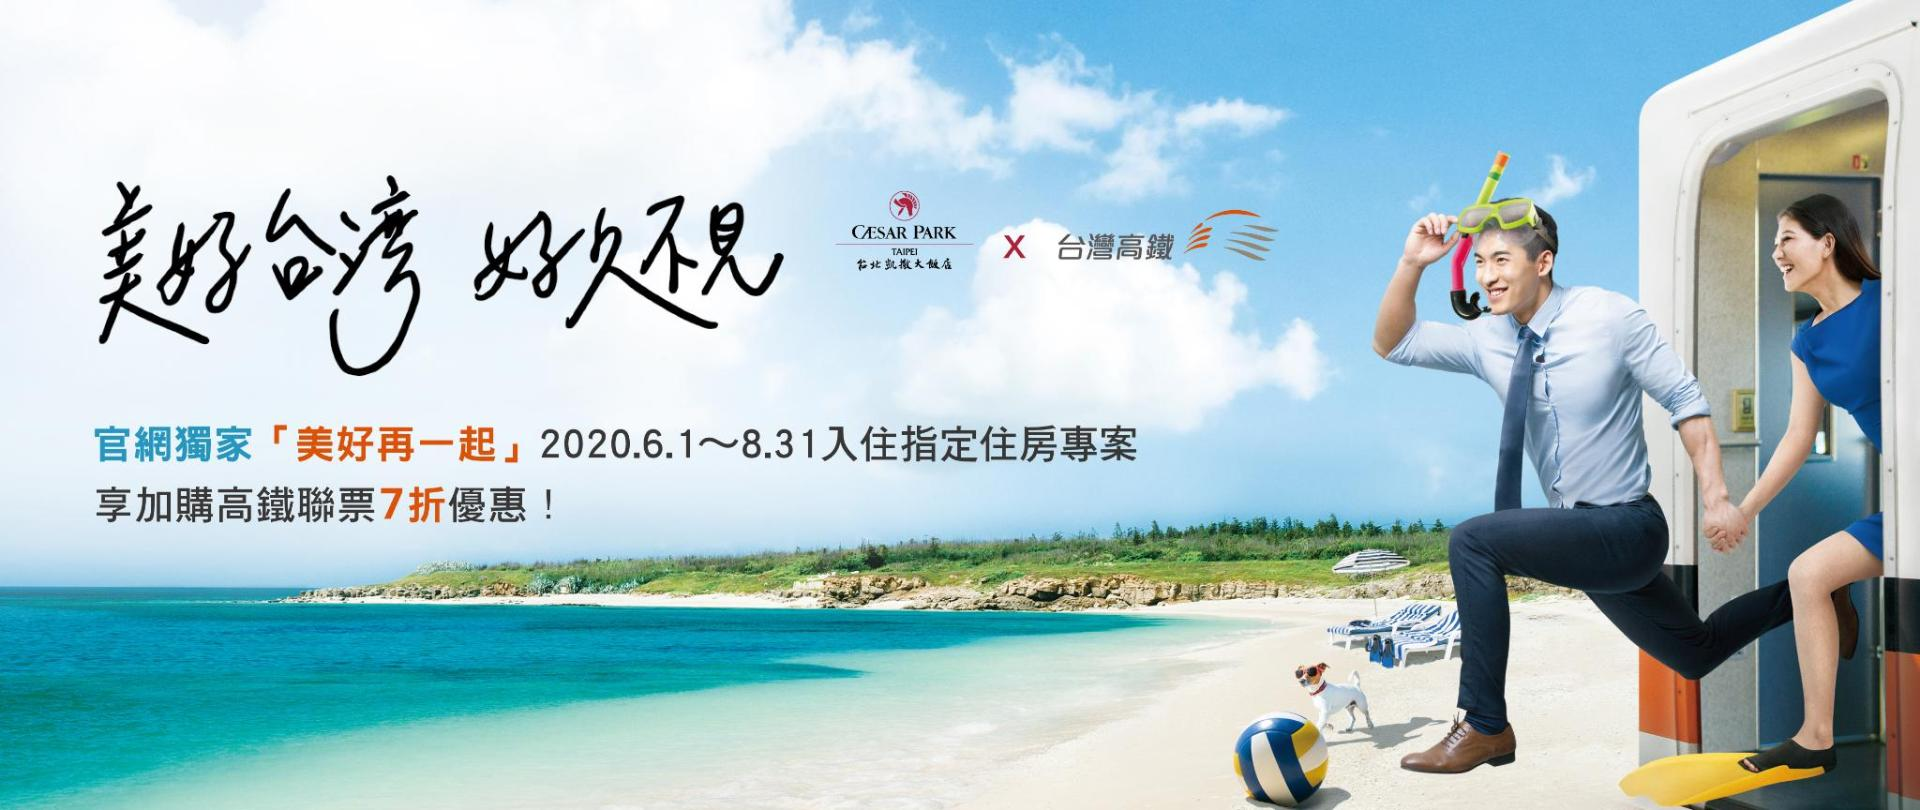 Slide Show1920X810_高鐵假期6-8月國旅振興.jpg